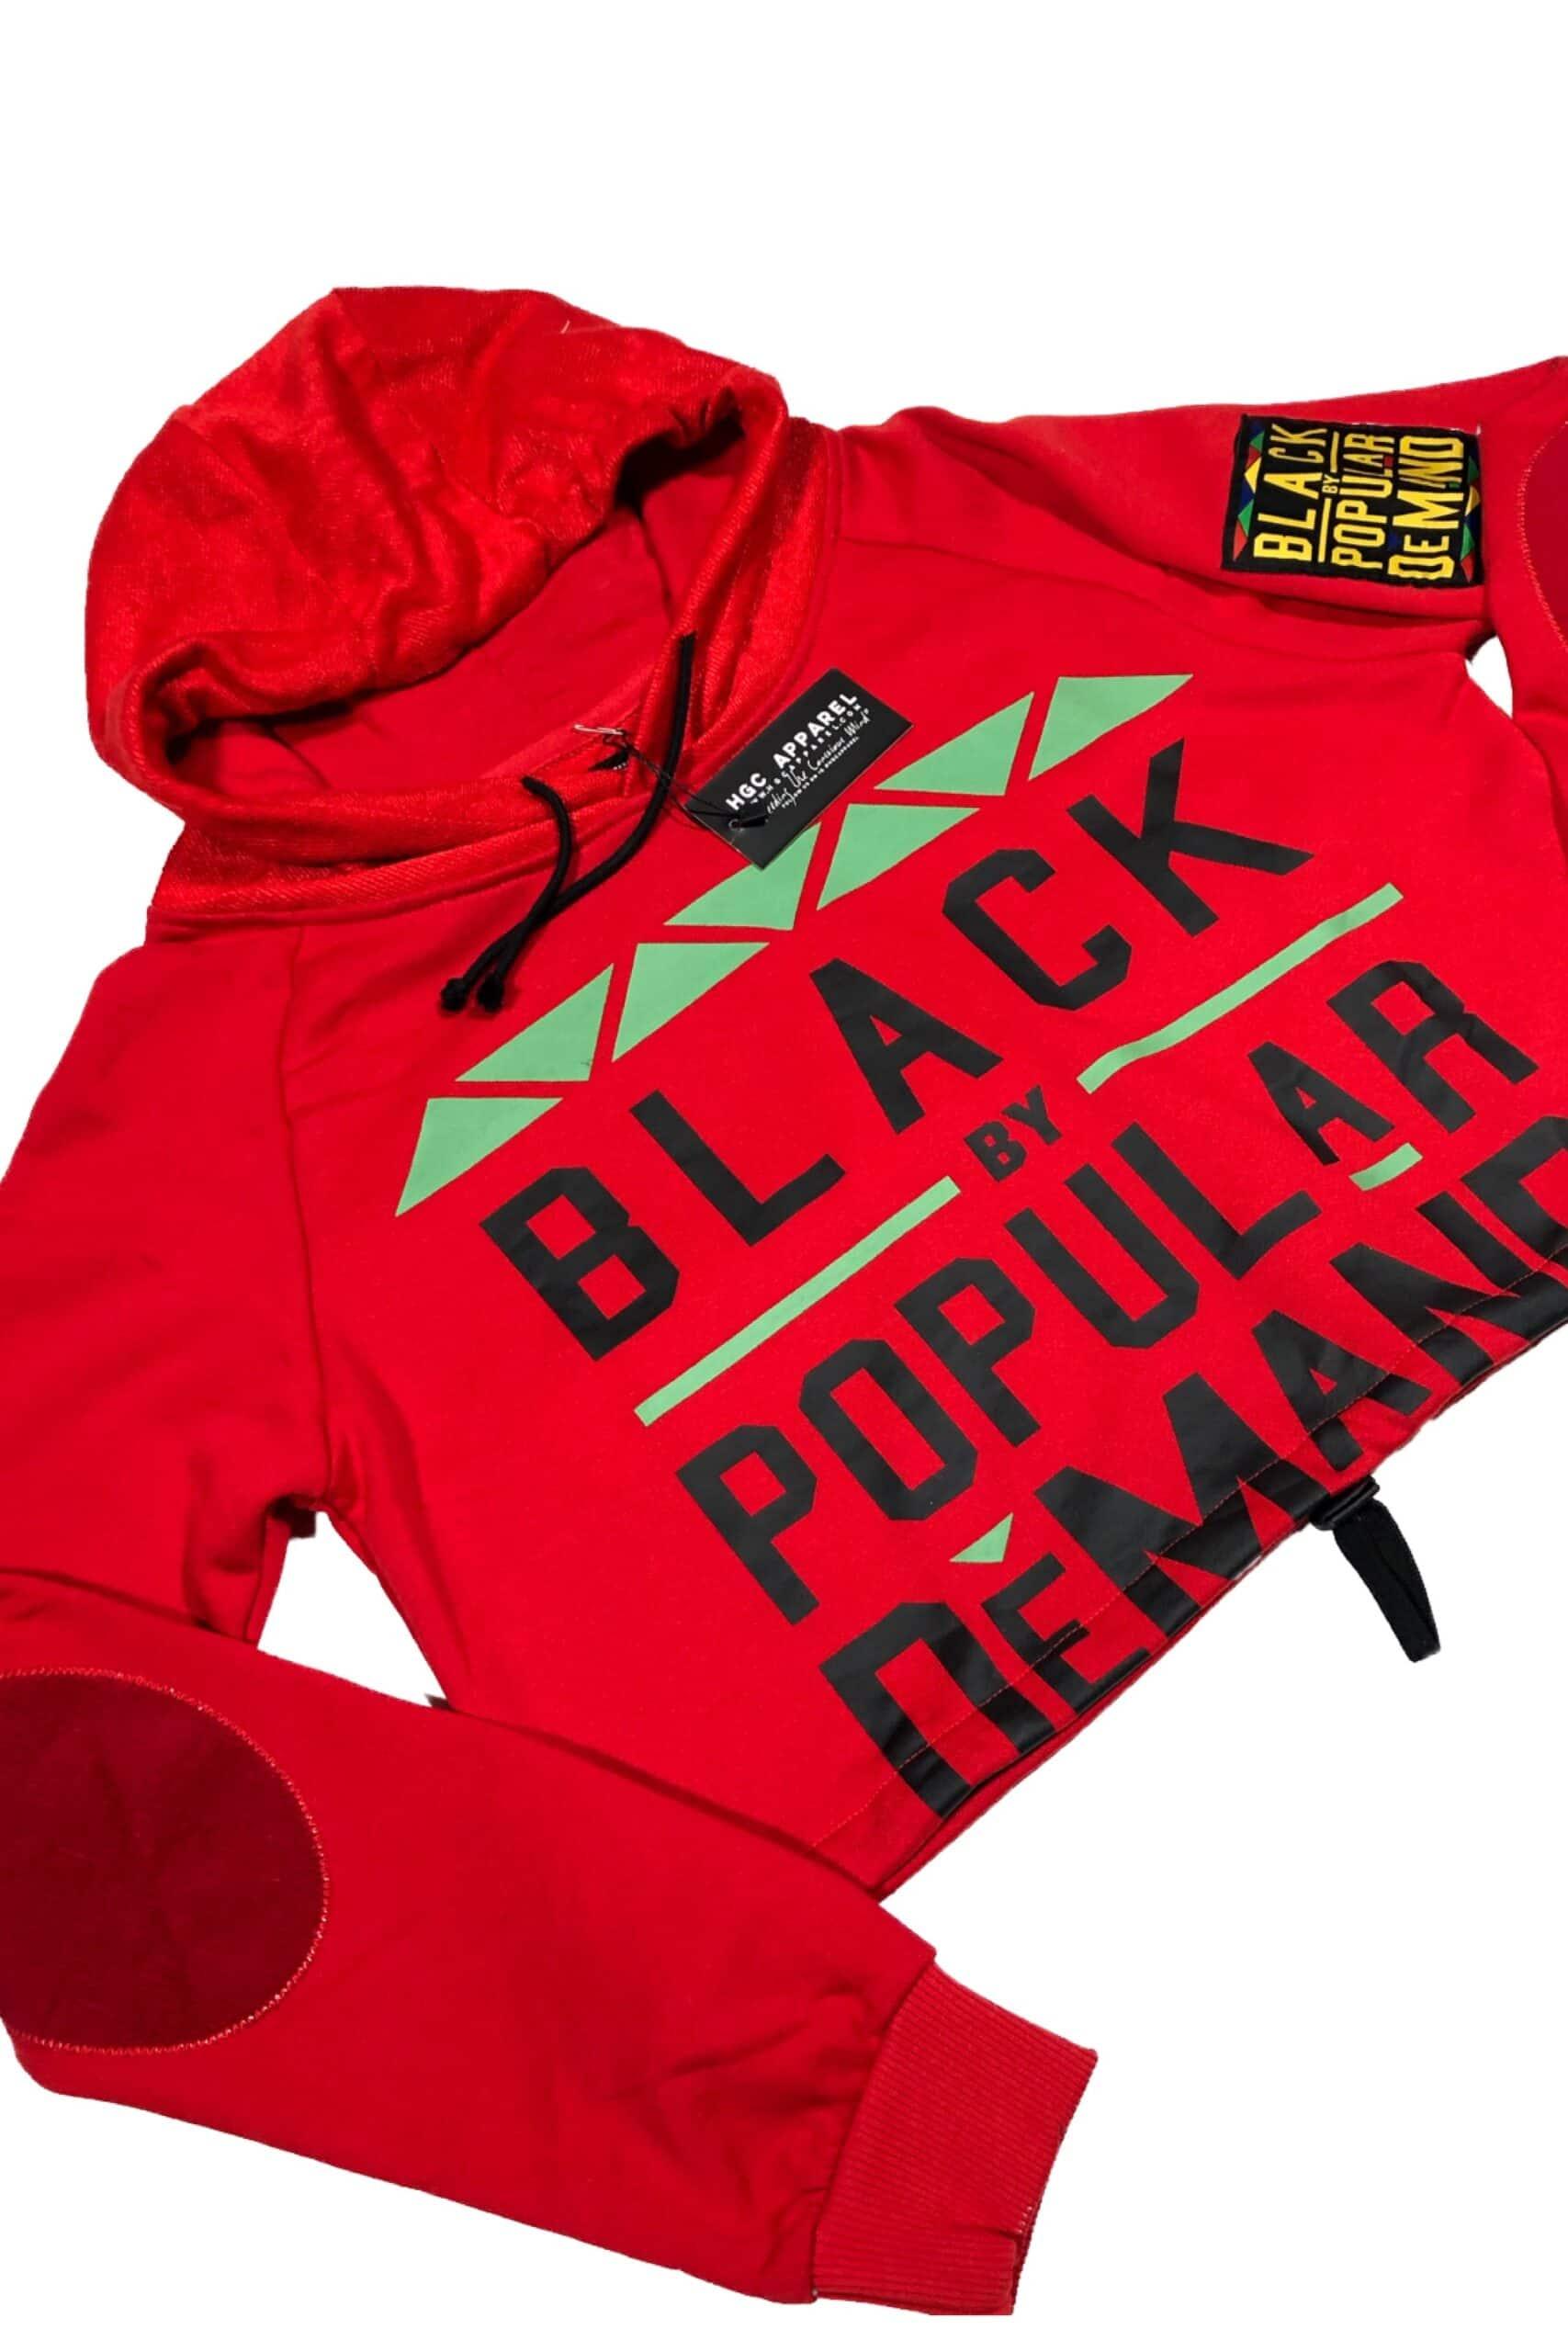 Black by Popular Demand® Red Women's Crop Hoodie Sweatshirt HGC Apparel